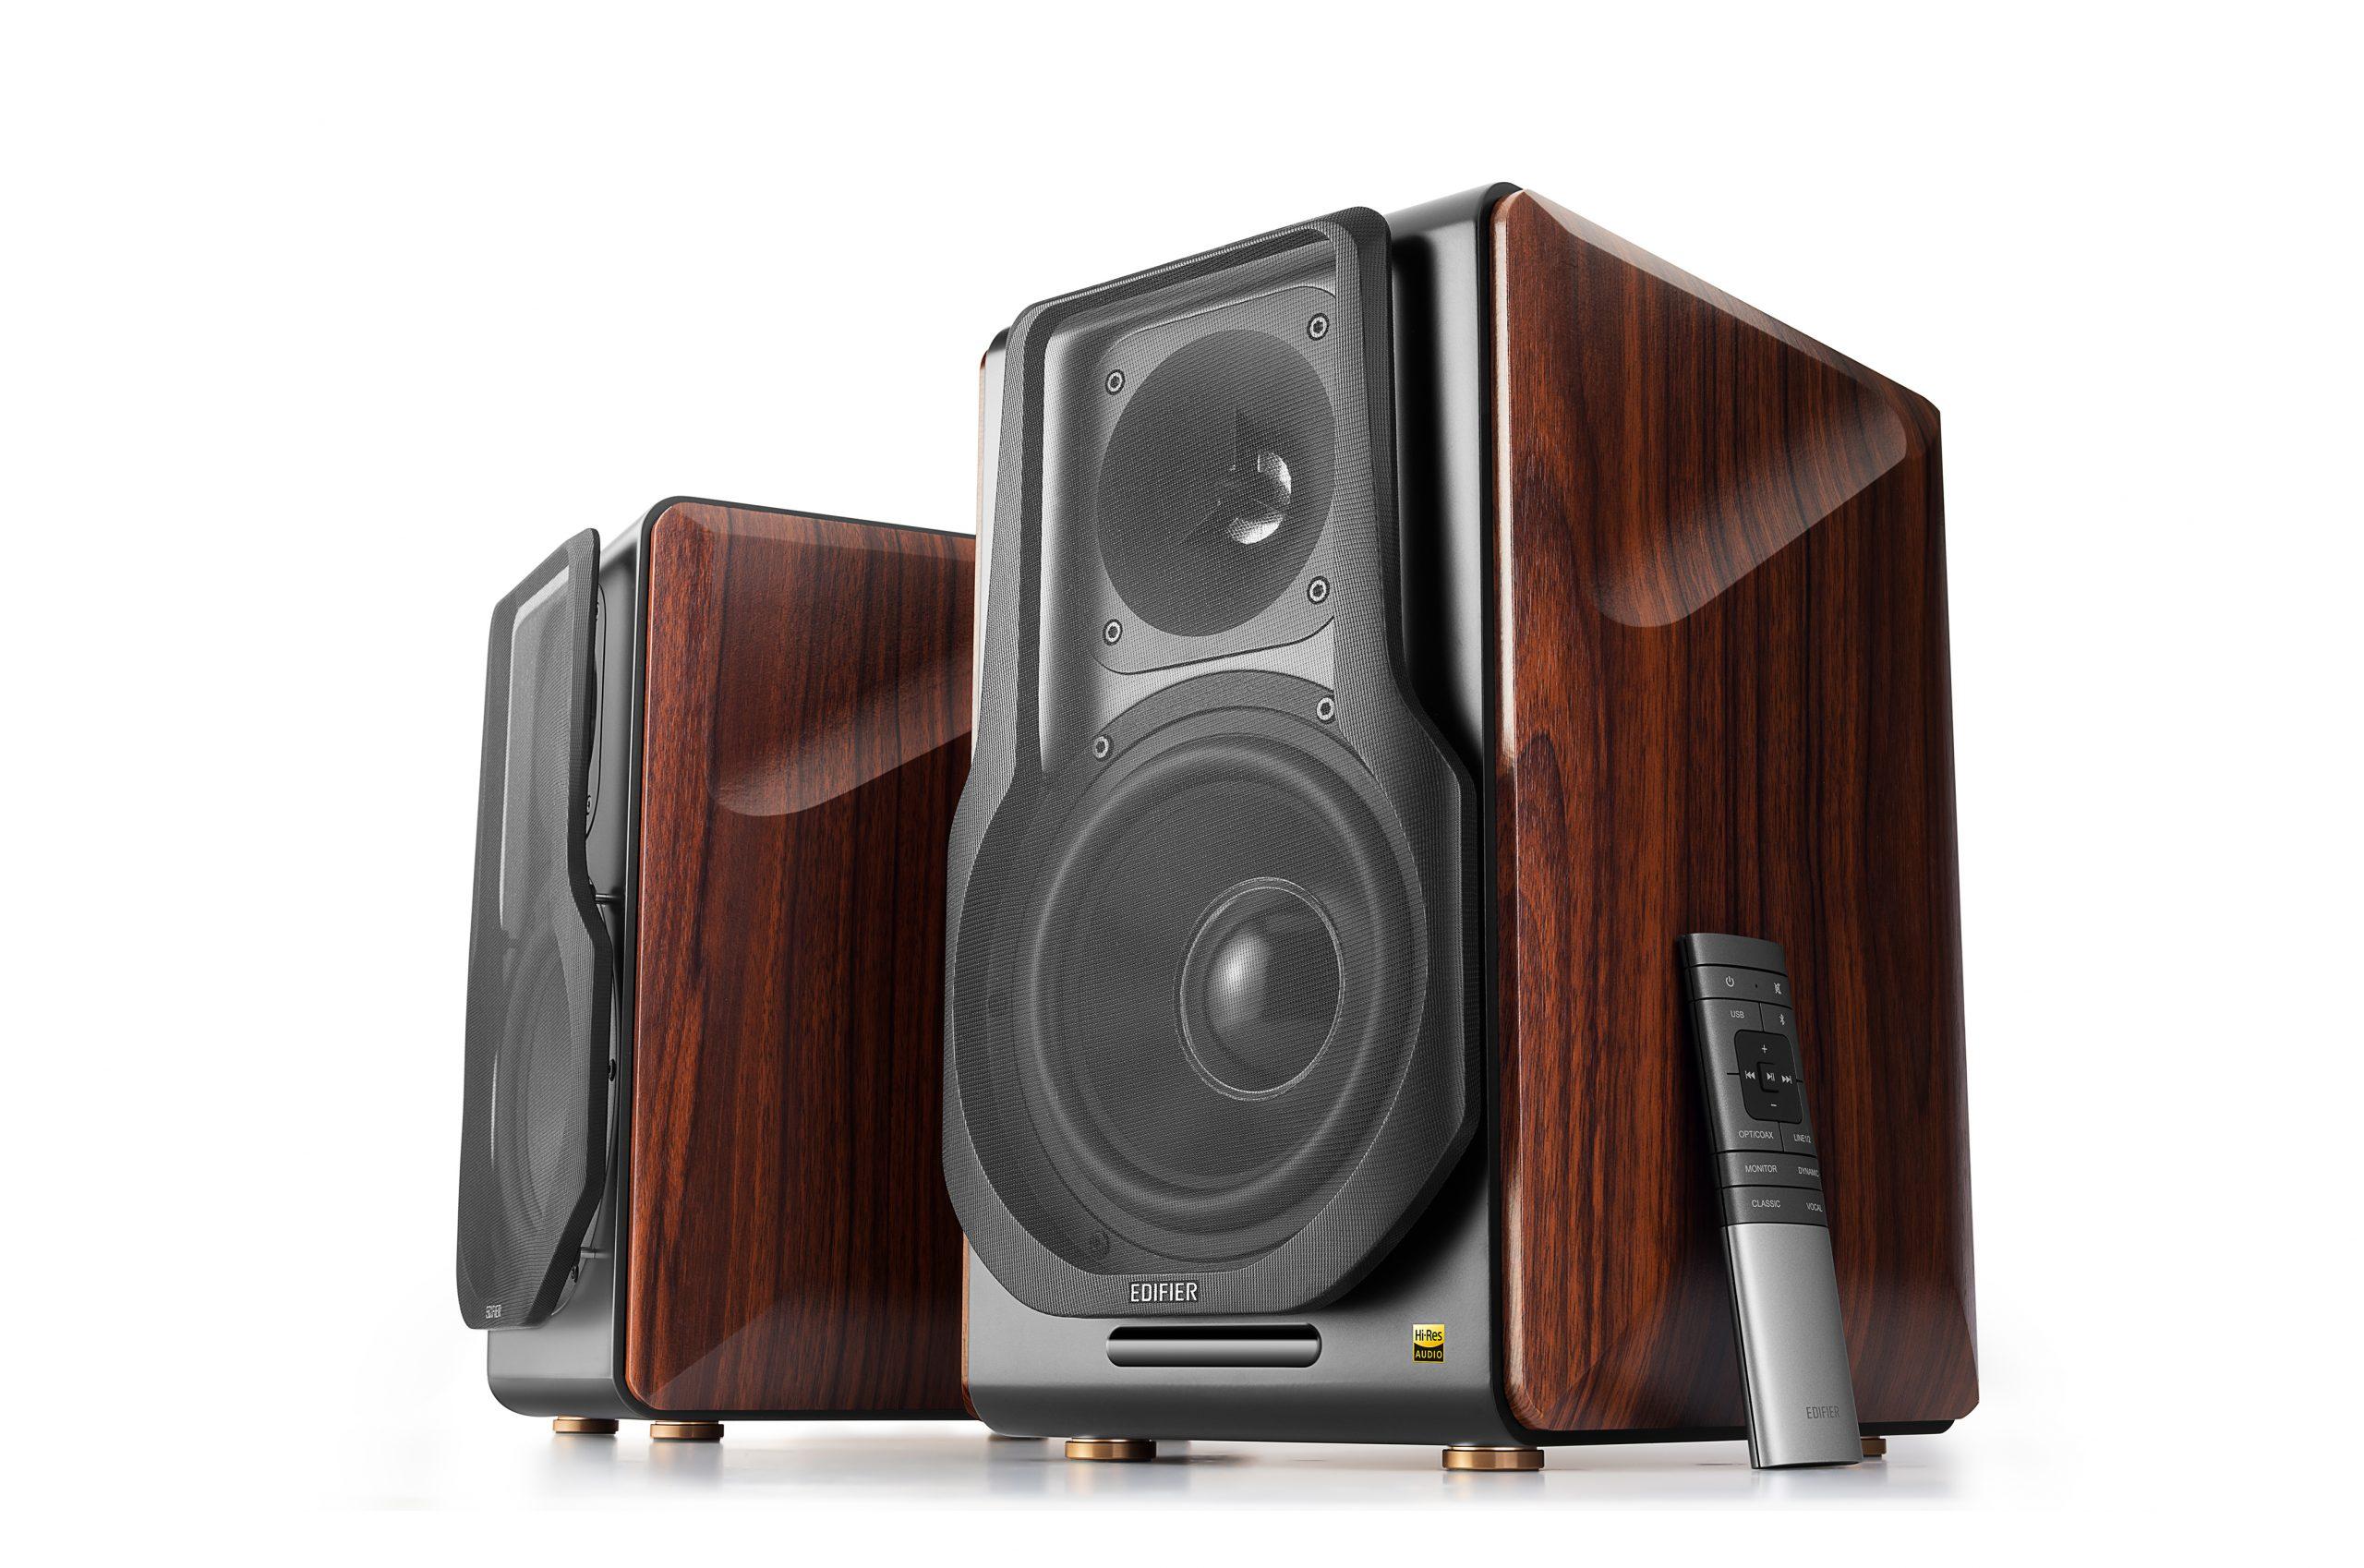 Edifier Shows Comprehensive Speaker Range at CES 2020